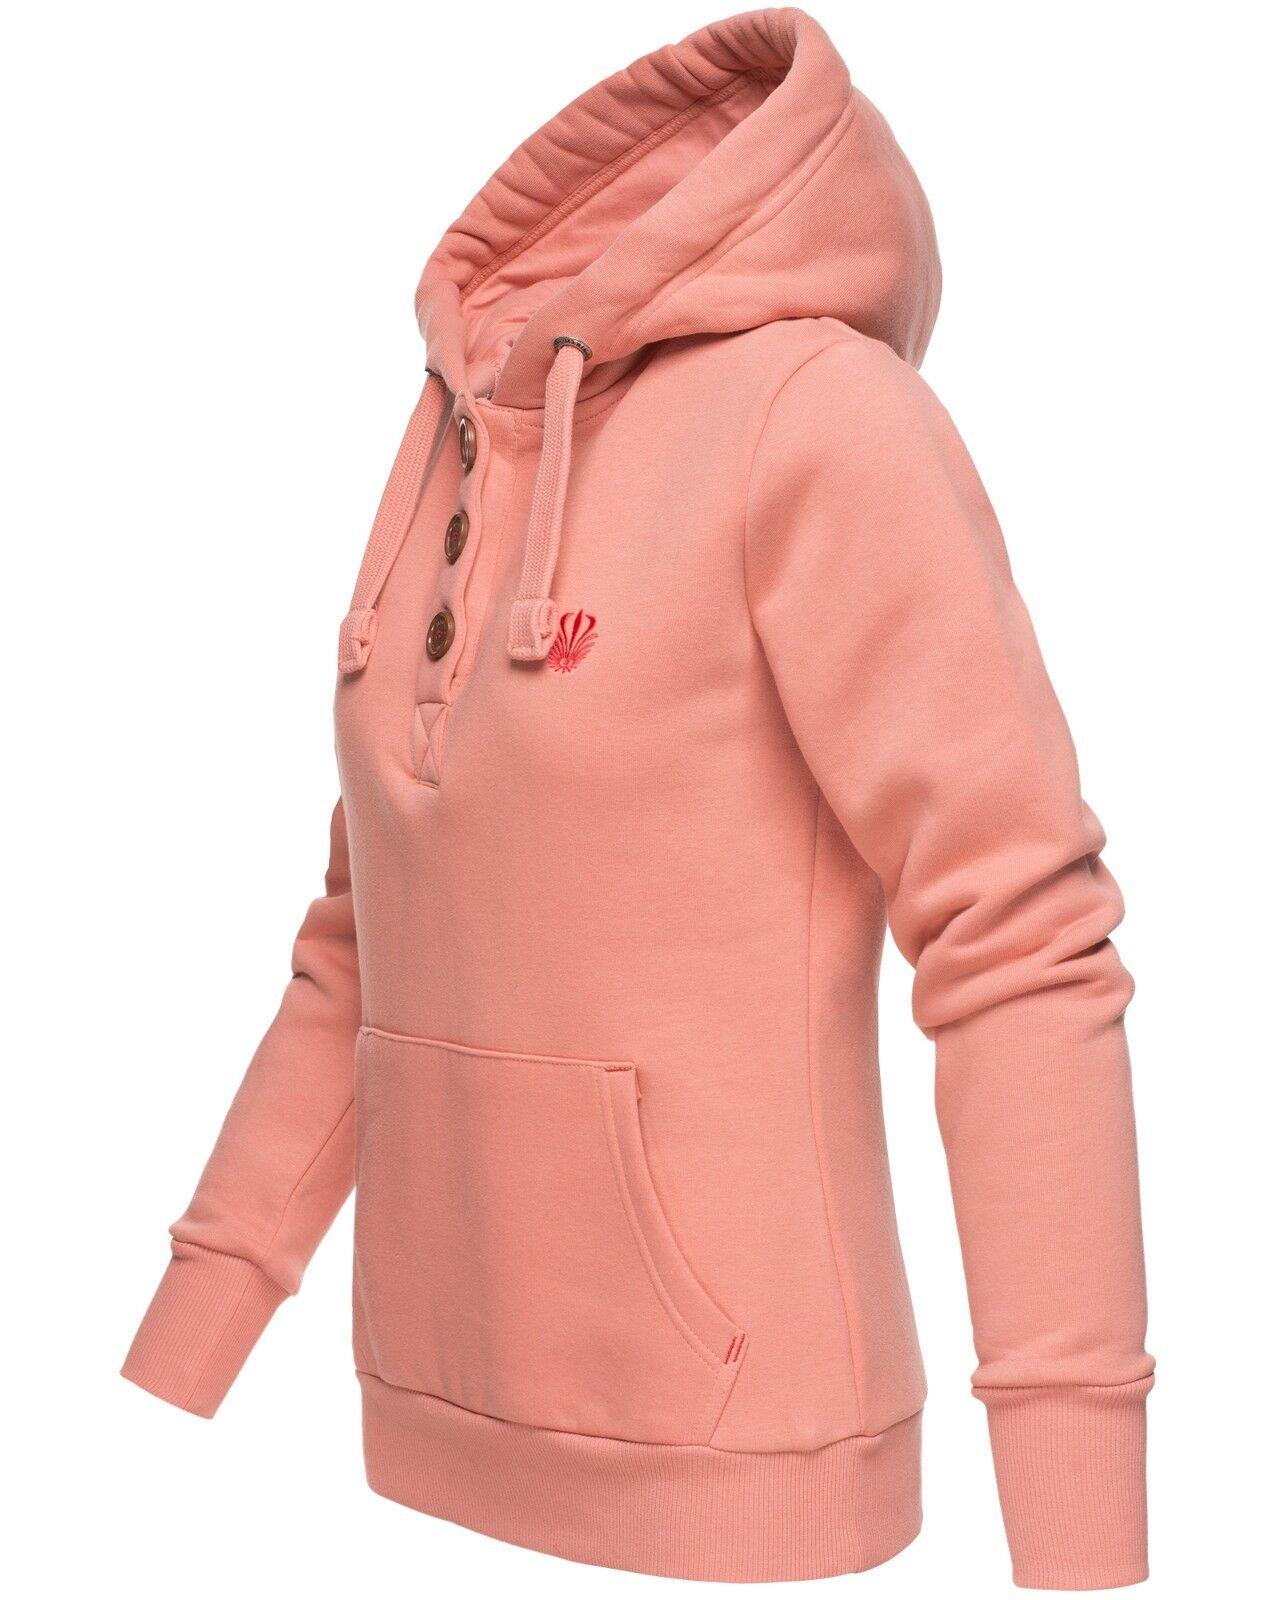 Marikoo Damen Sweatshirt Kapuzenpullover Sweatshirt Hoodie Pulli Sweater Yurikoo